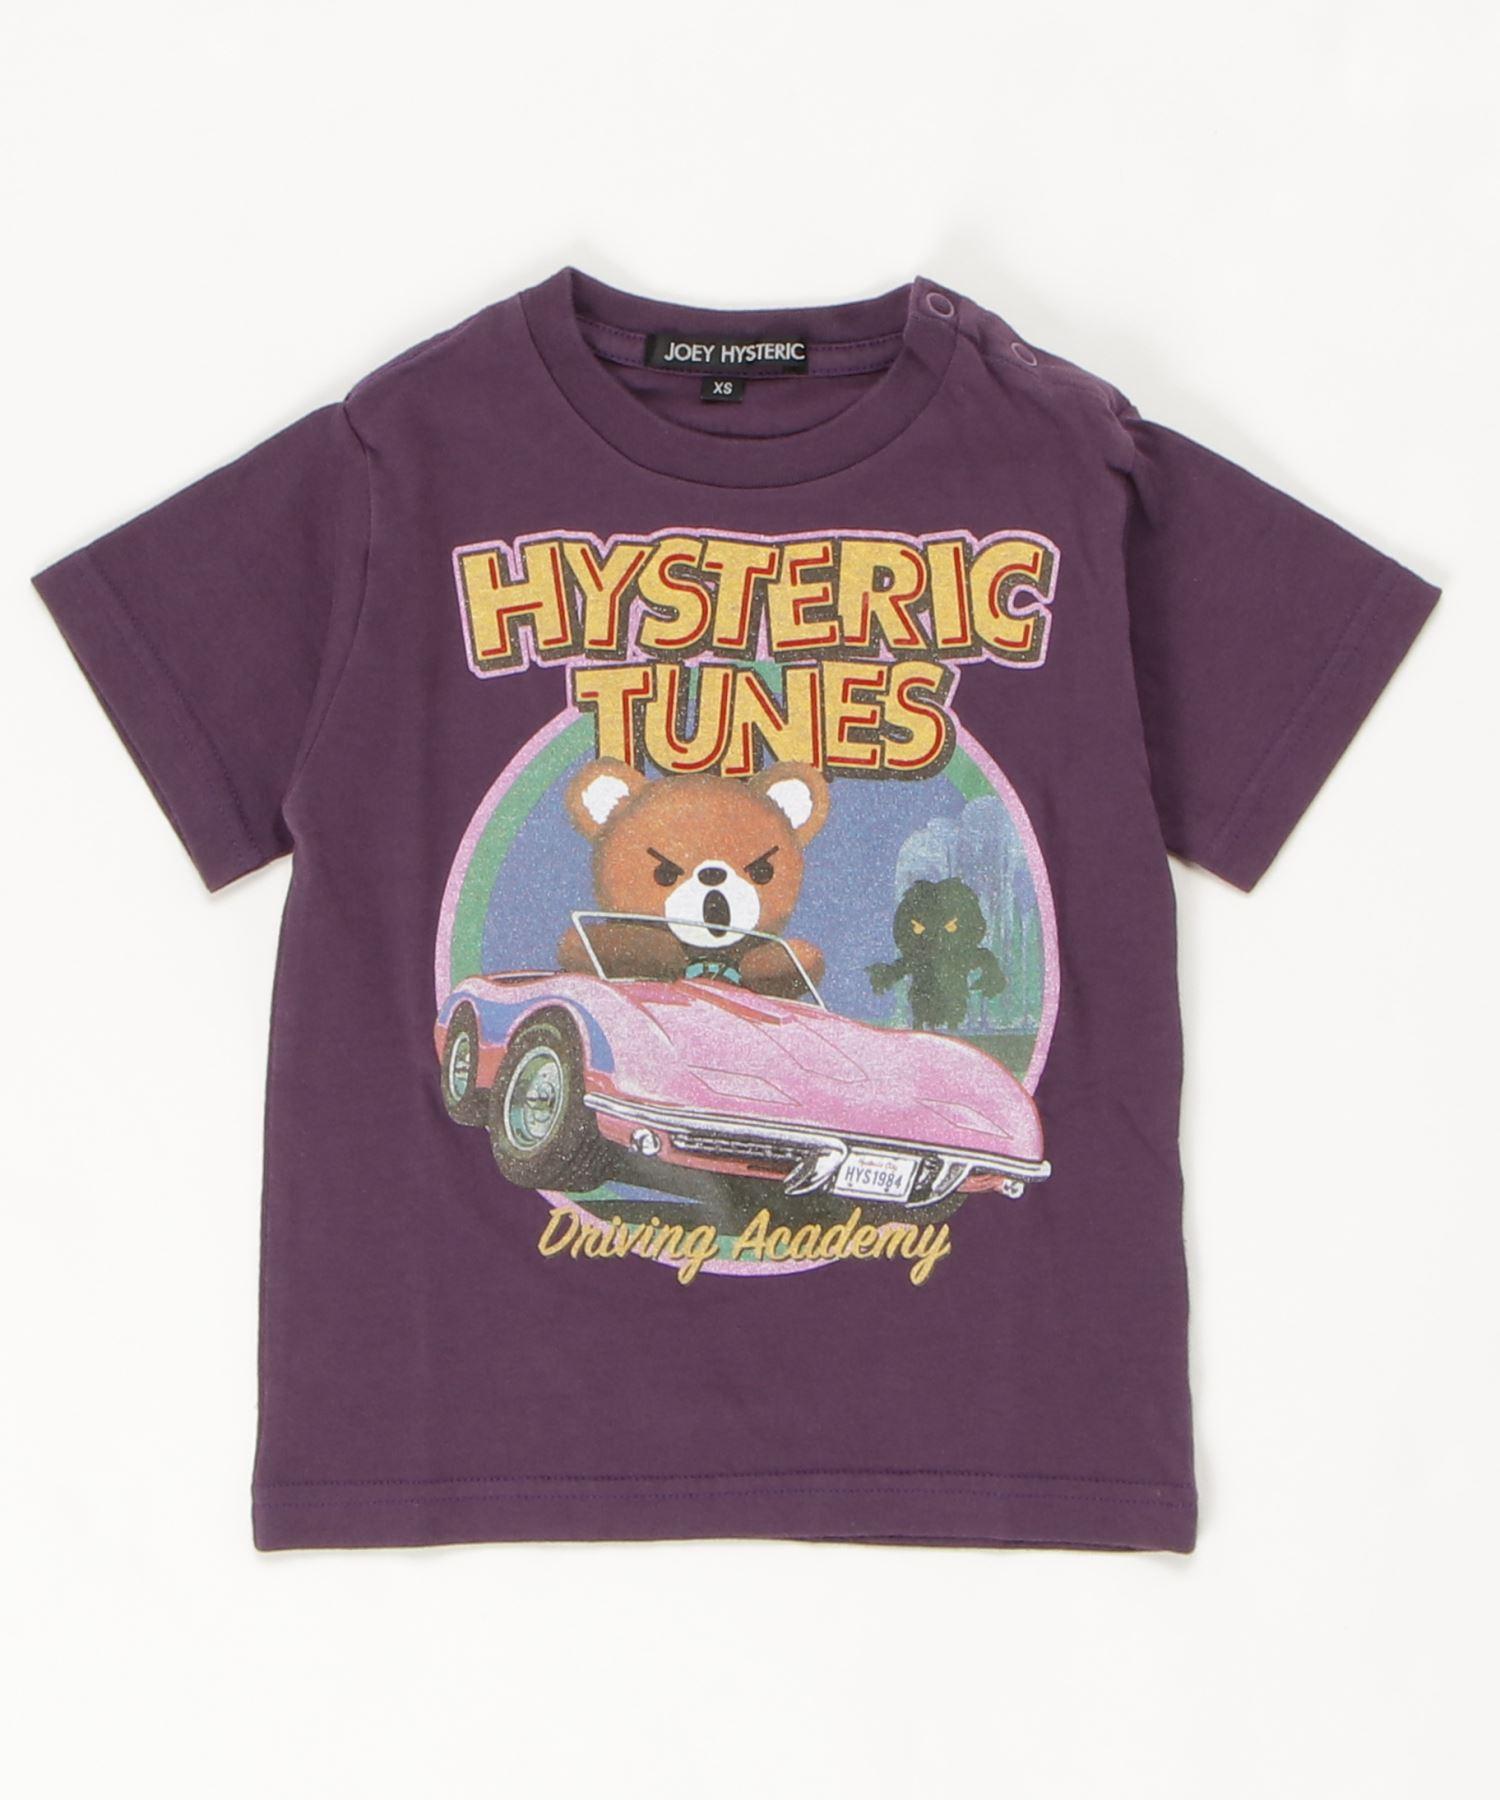 HYSTERIC TUNES pt Tシャツ【XS/S/M】